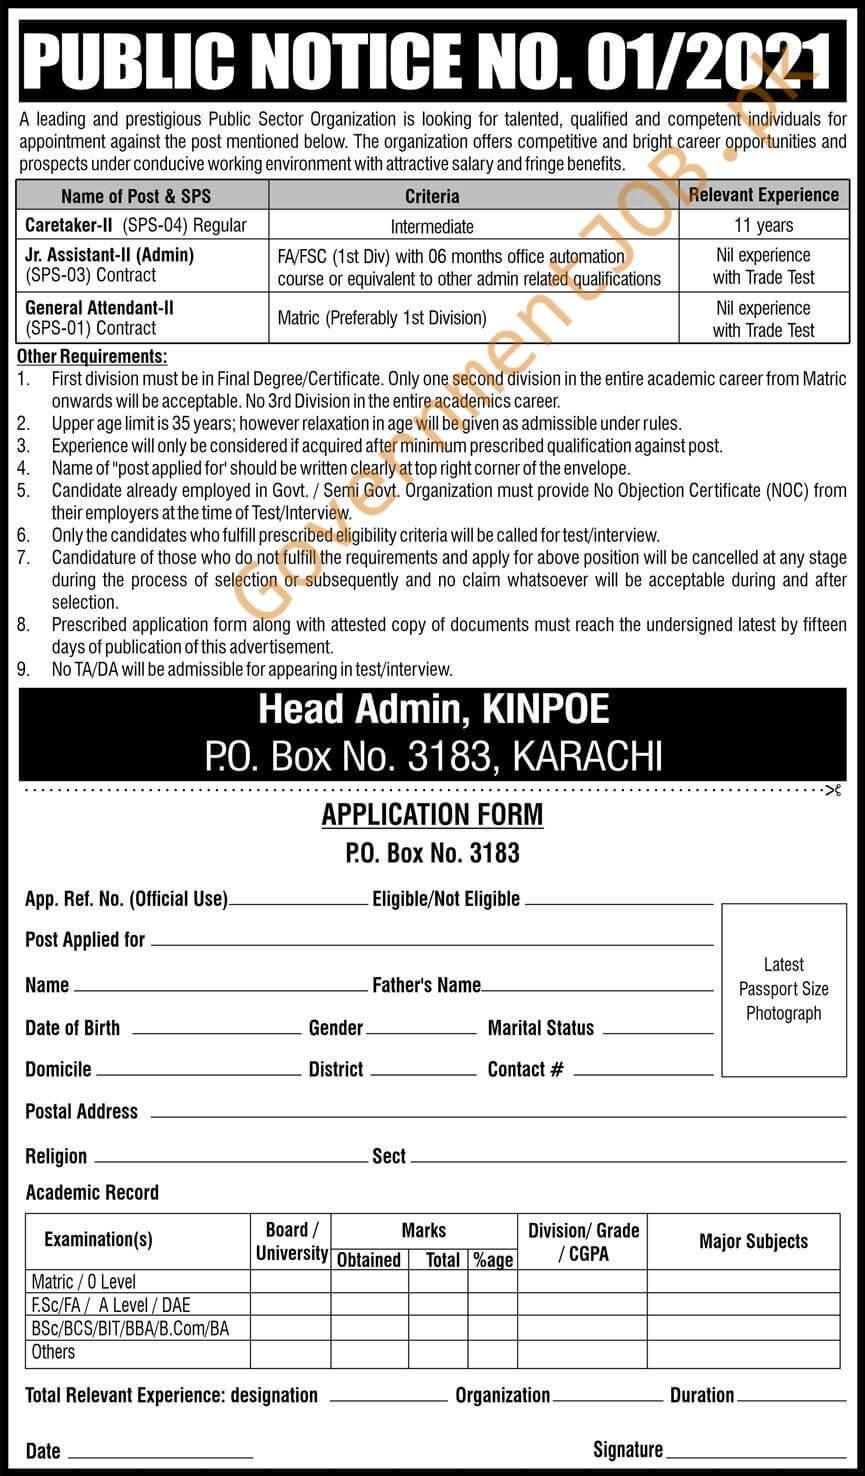 Pakistan Atomic Energy Commission (PAEC) Jobs 2021 in Pakistan